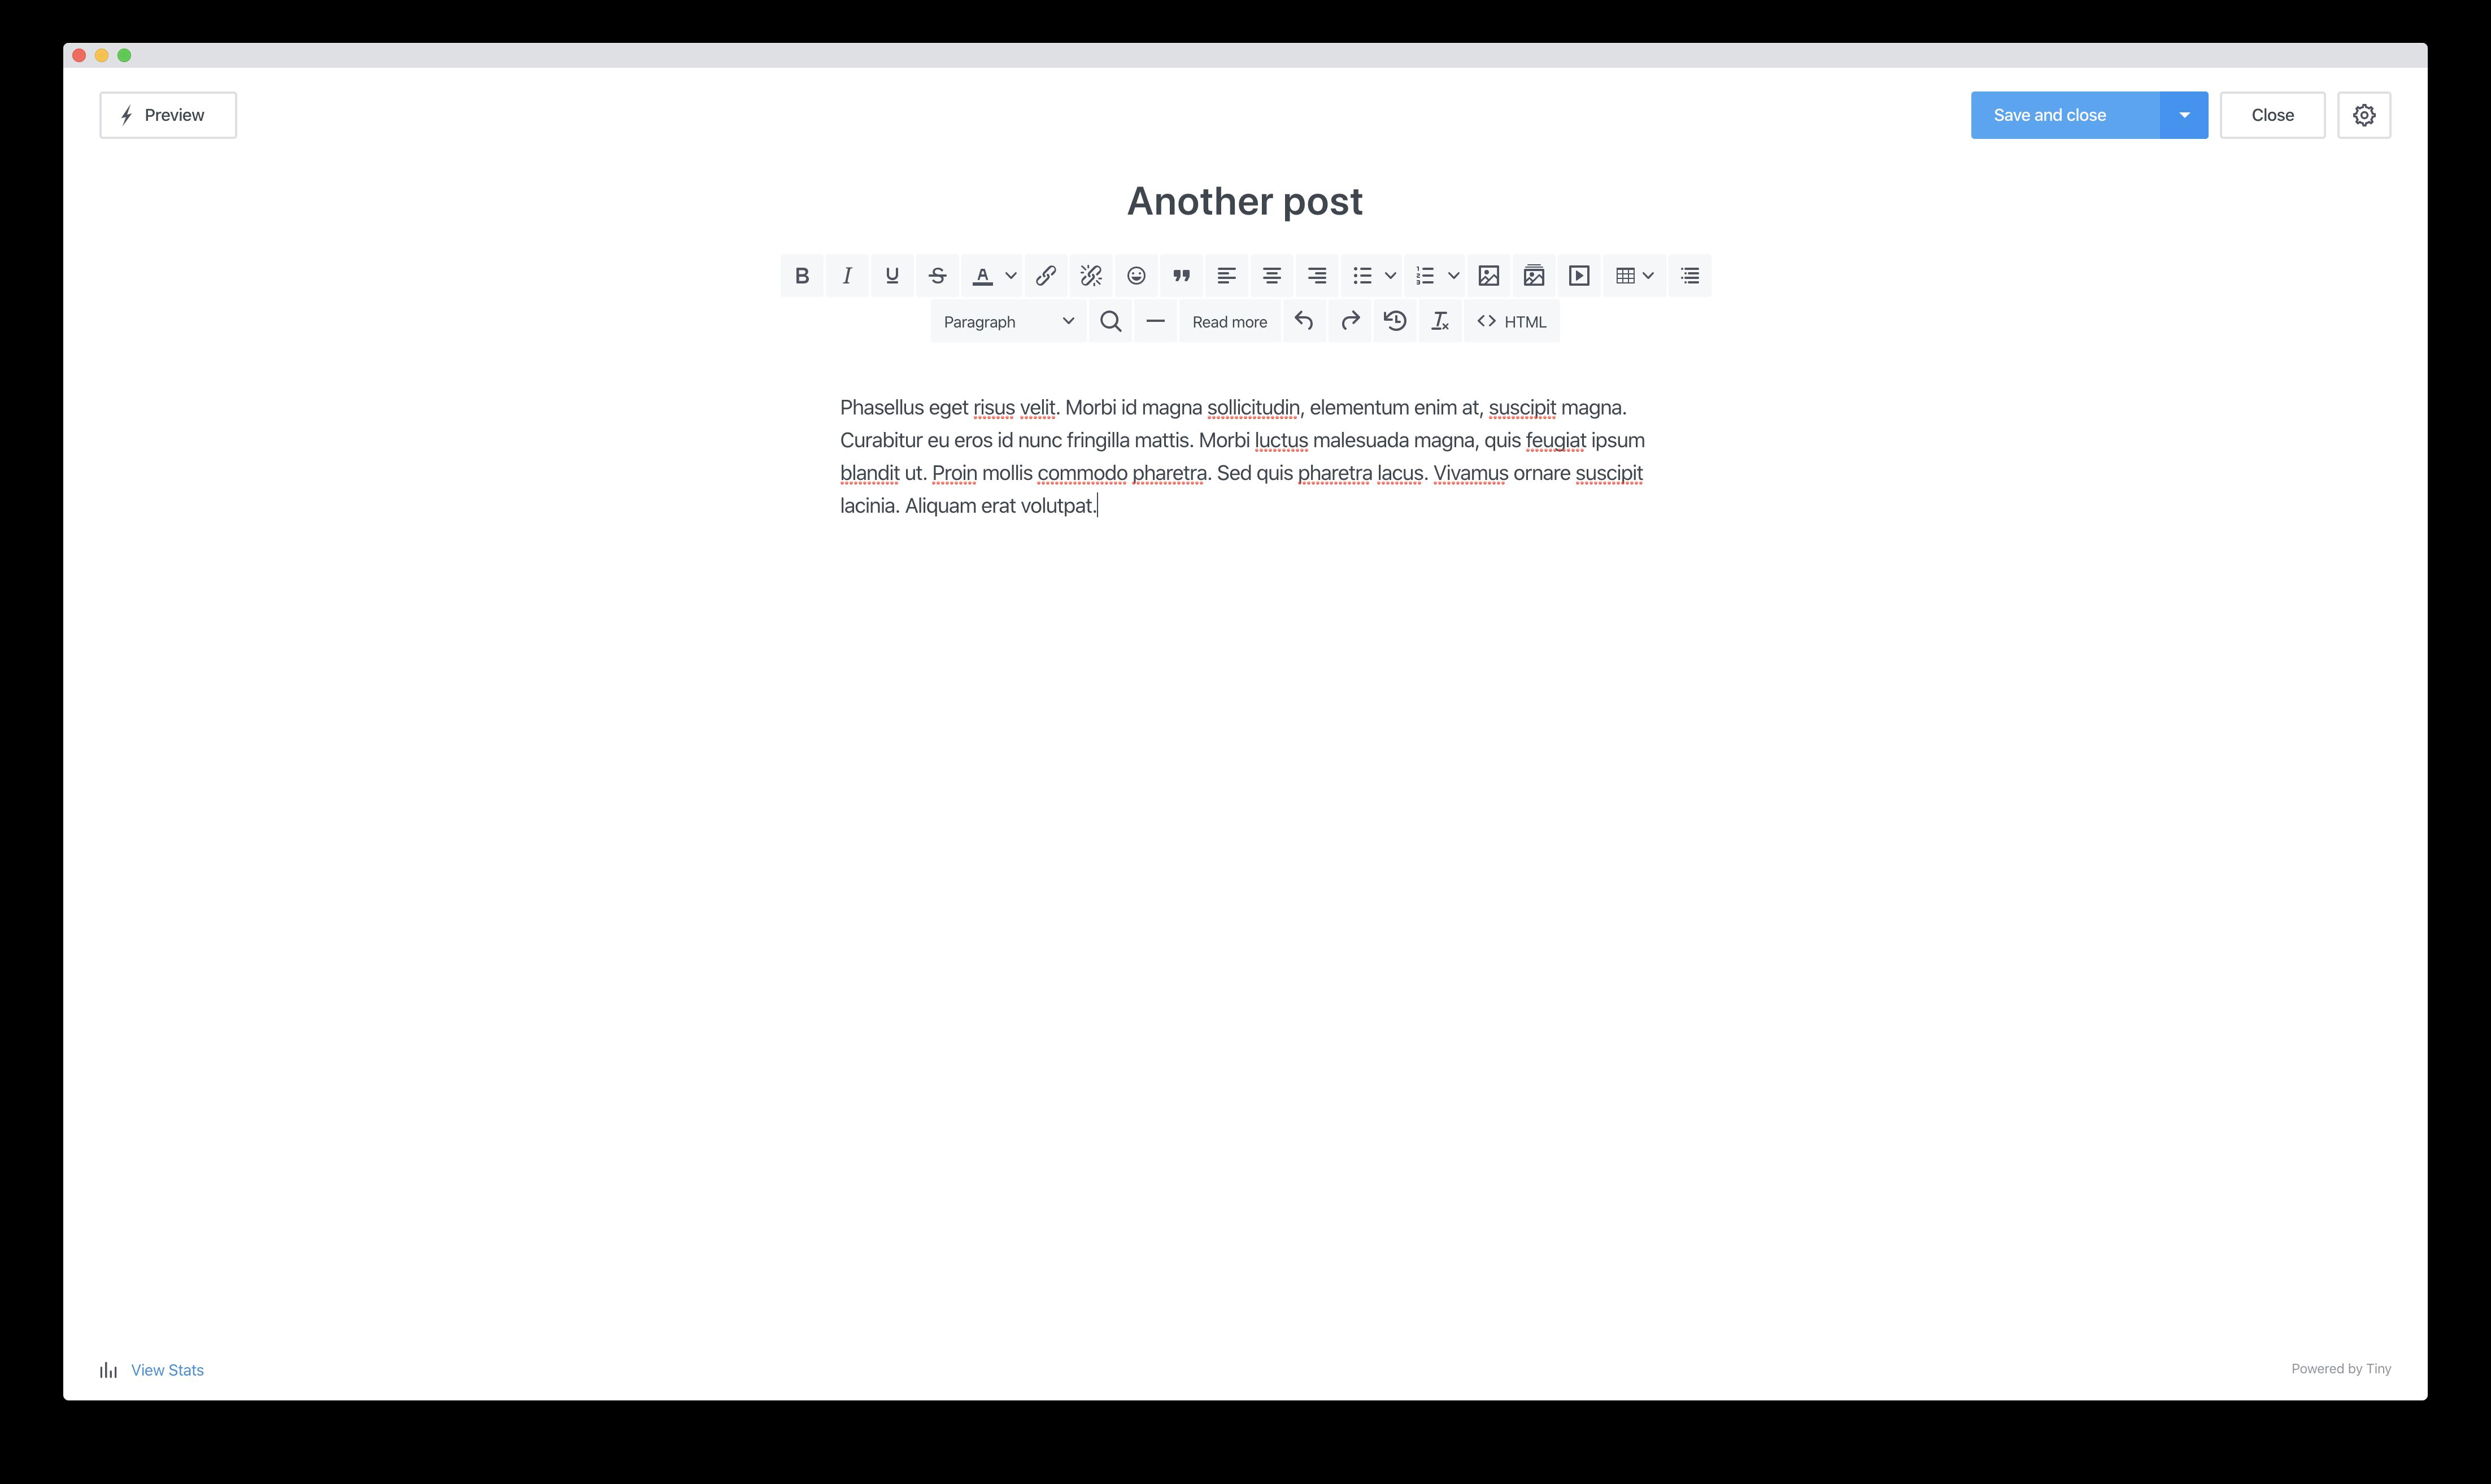 screenshot-2020-04-17-o-14.02.54